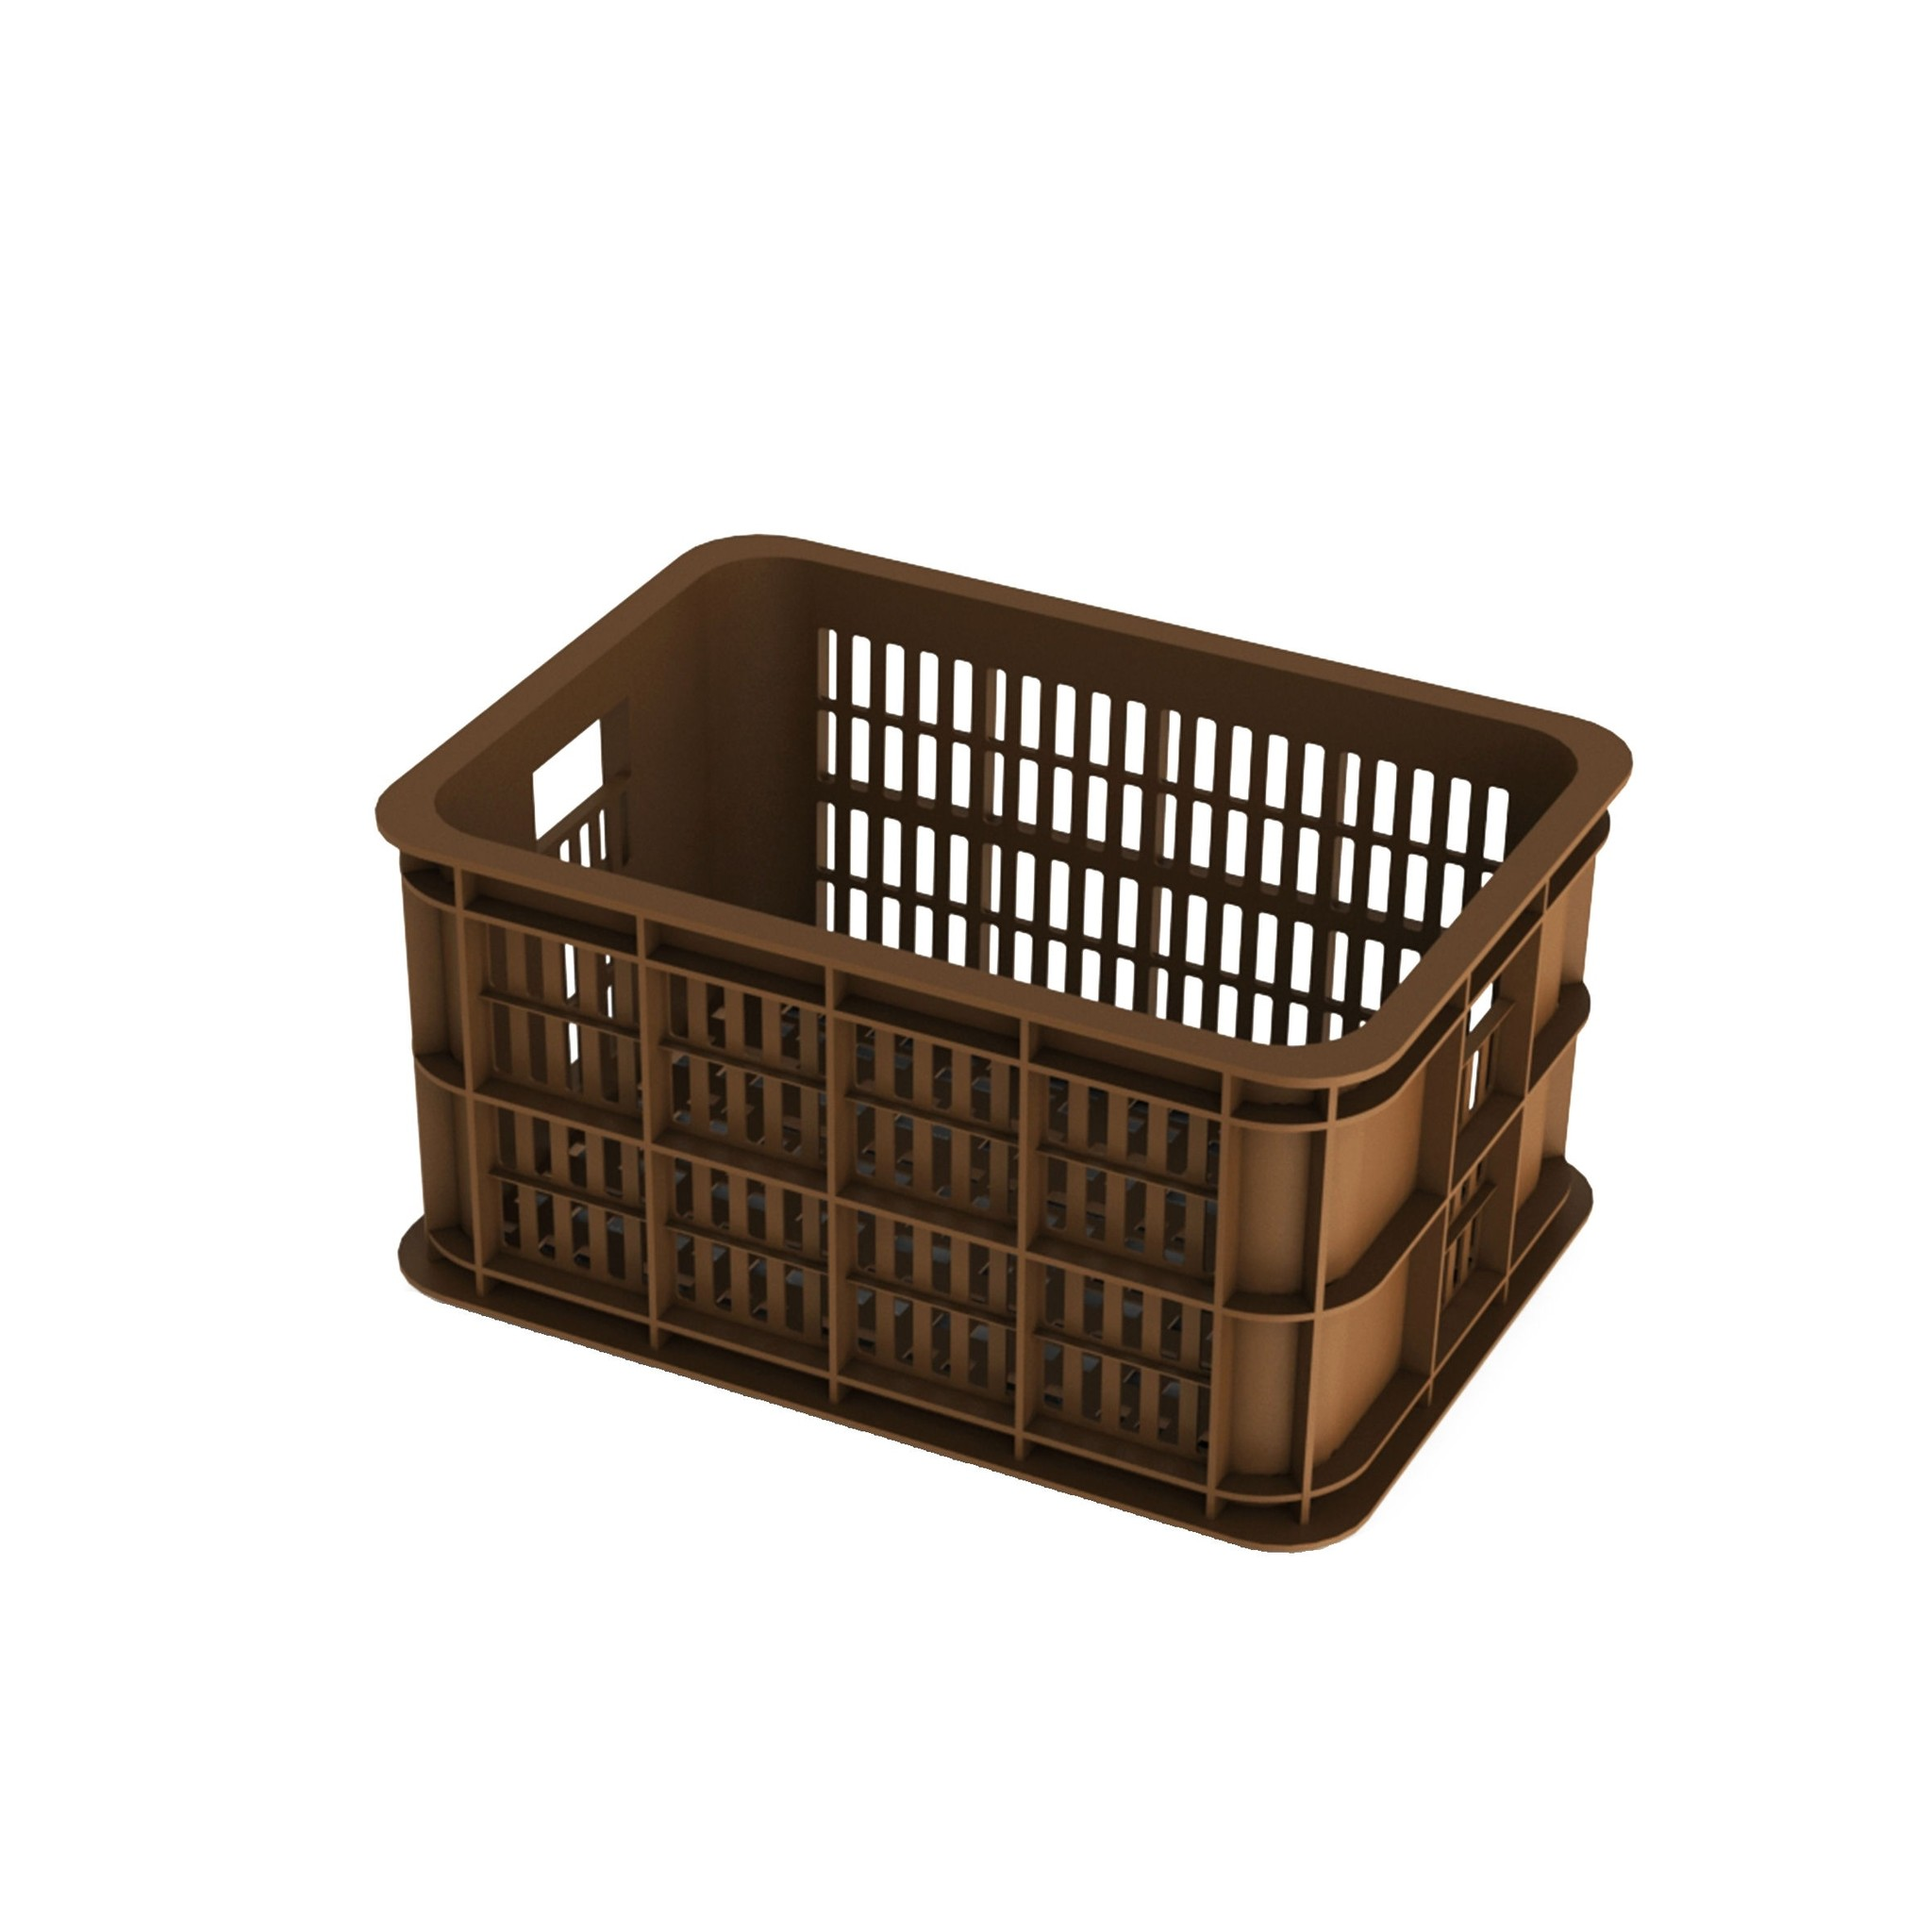 Basil Fietskrat Basil Crate small 25 liter - saddle brown